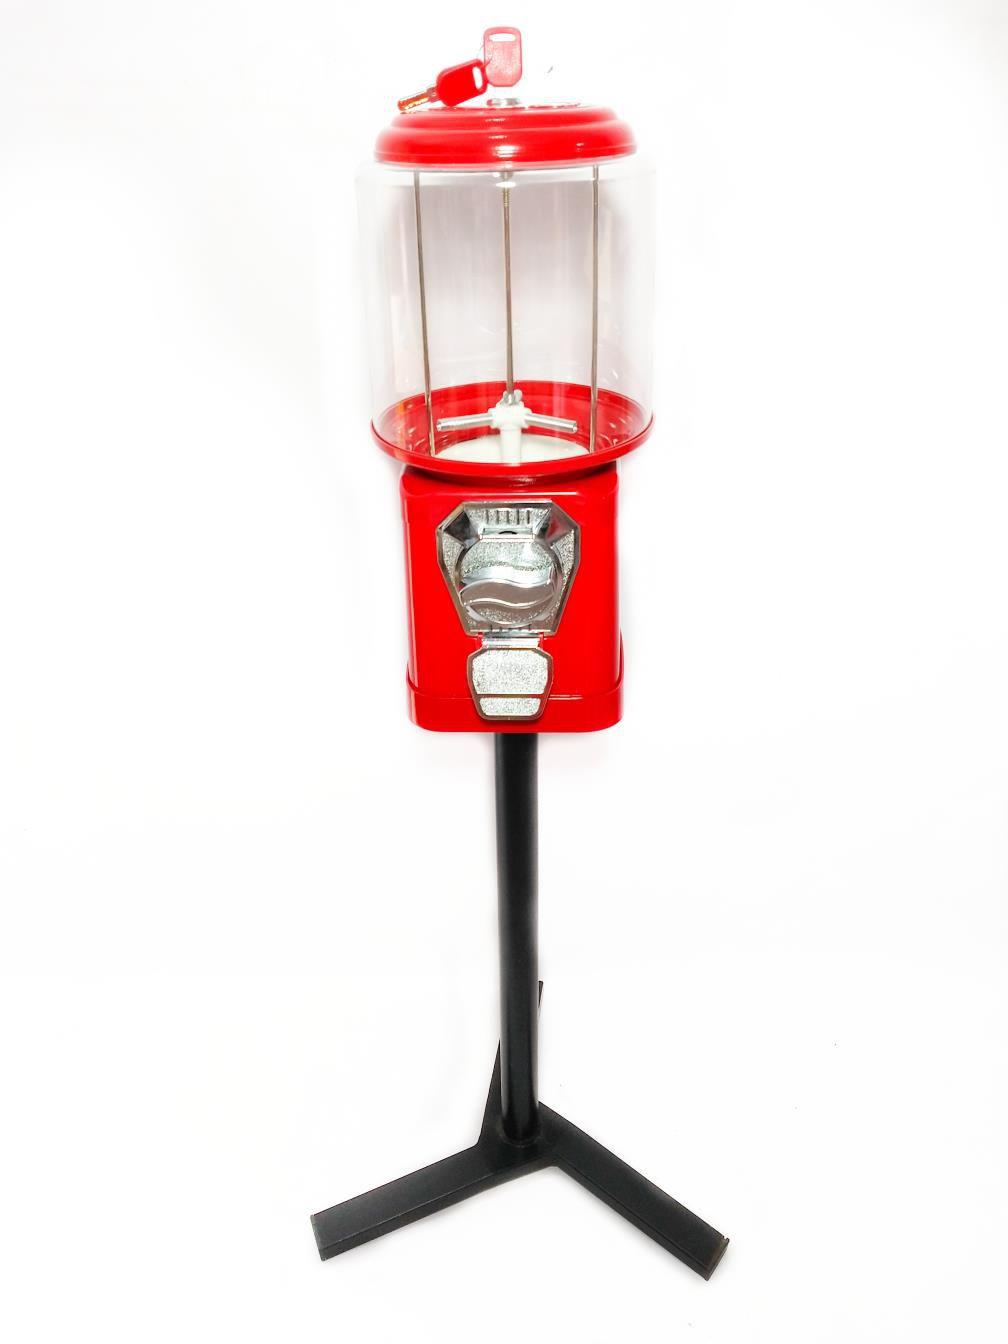 Kit Maquina de Bolinha Pula Pula + Pedestal